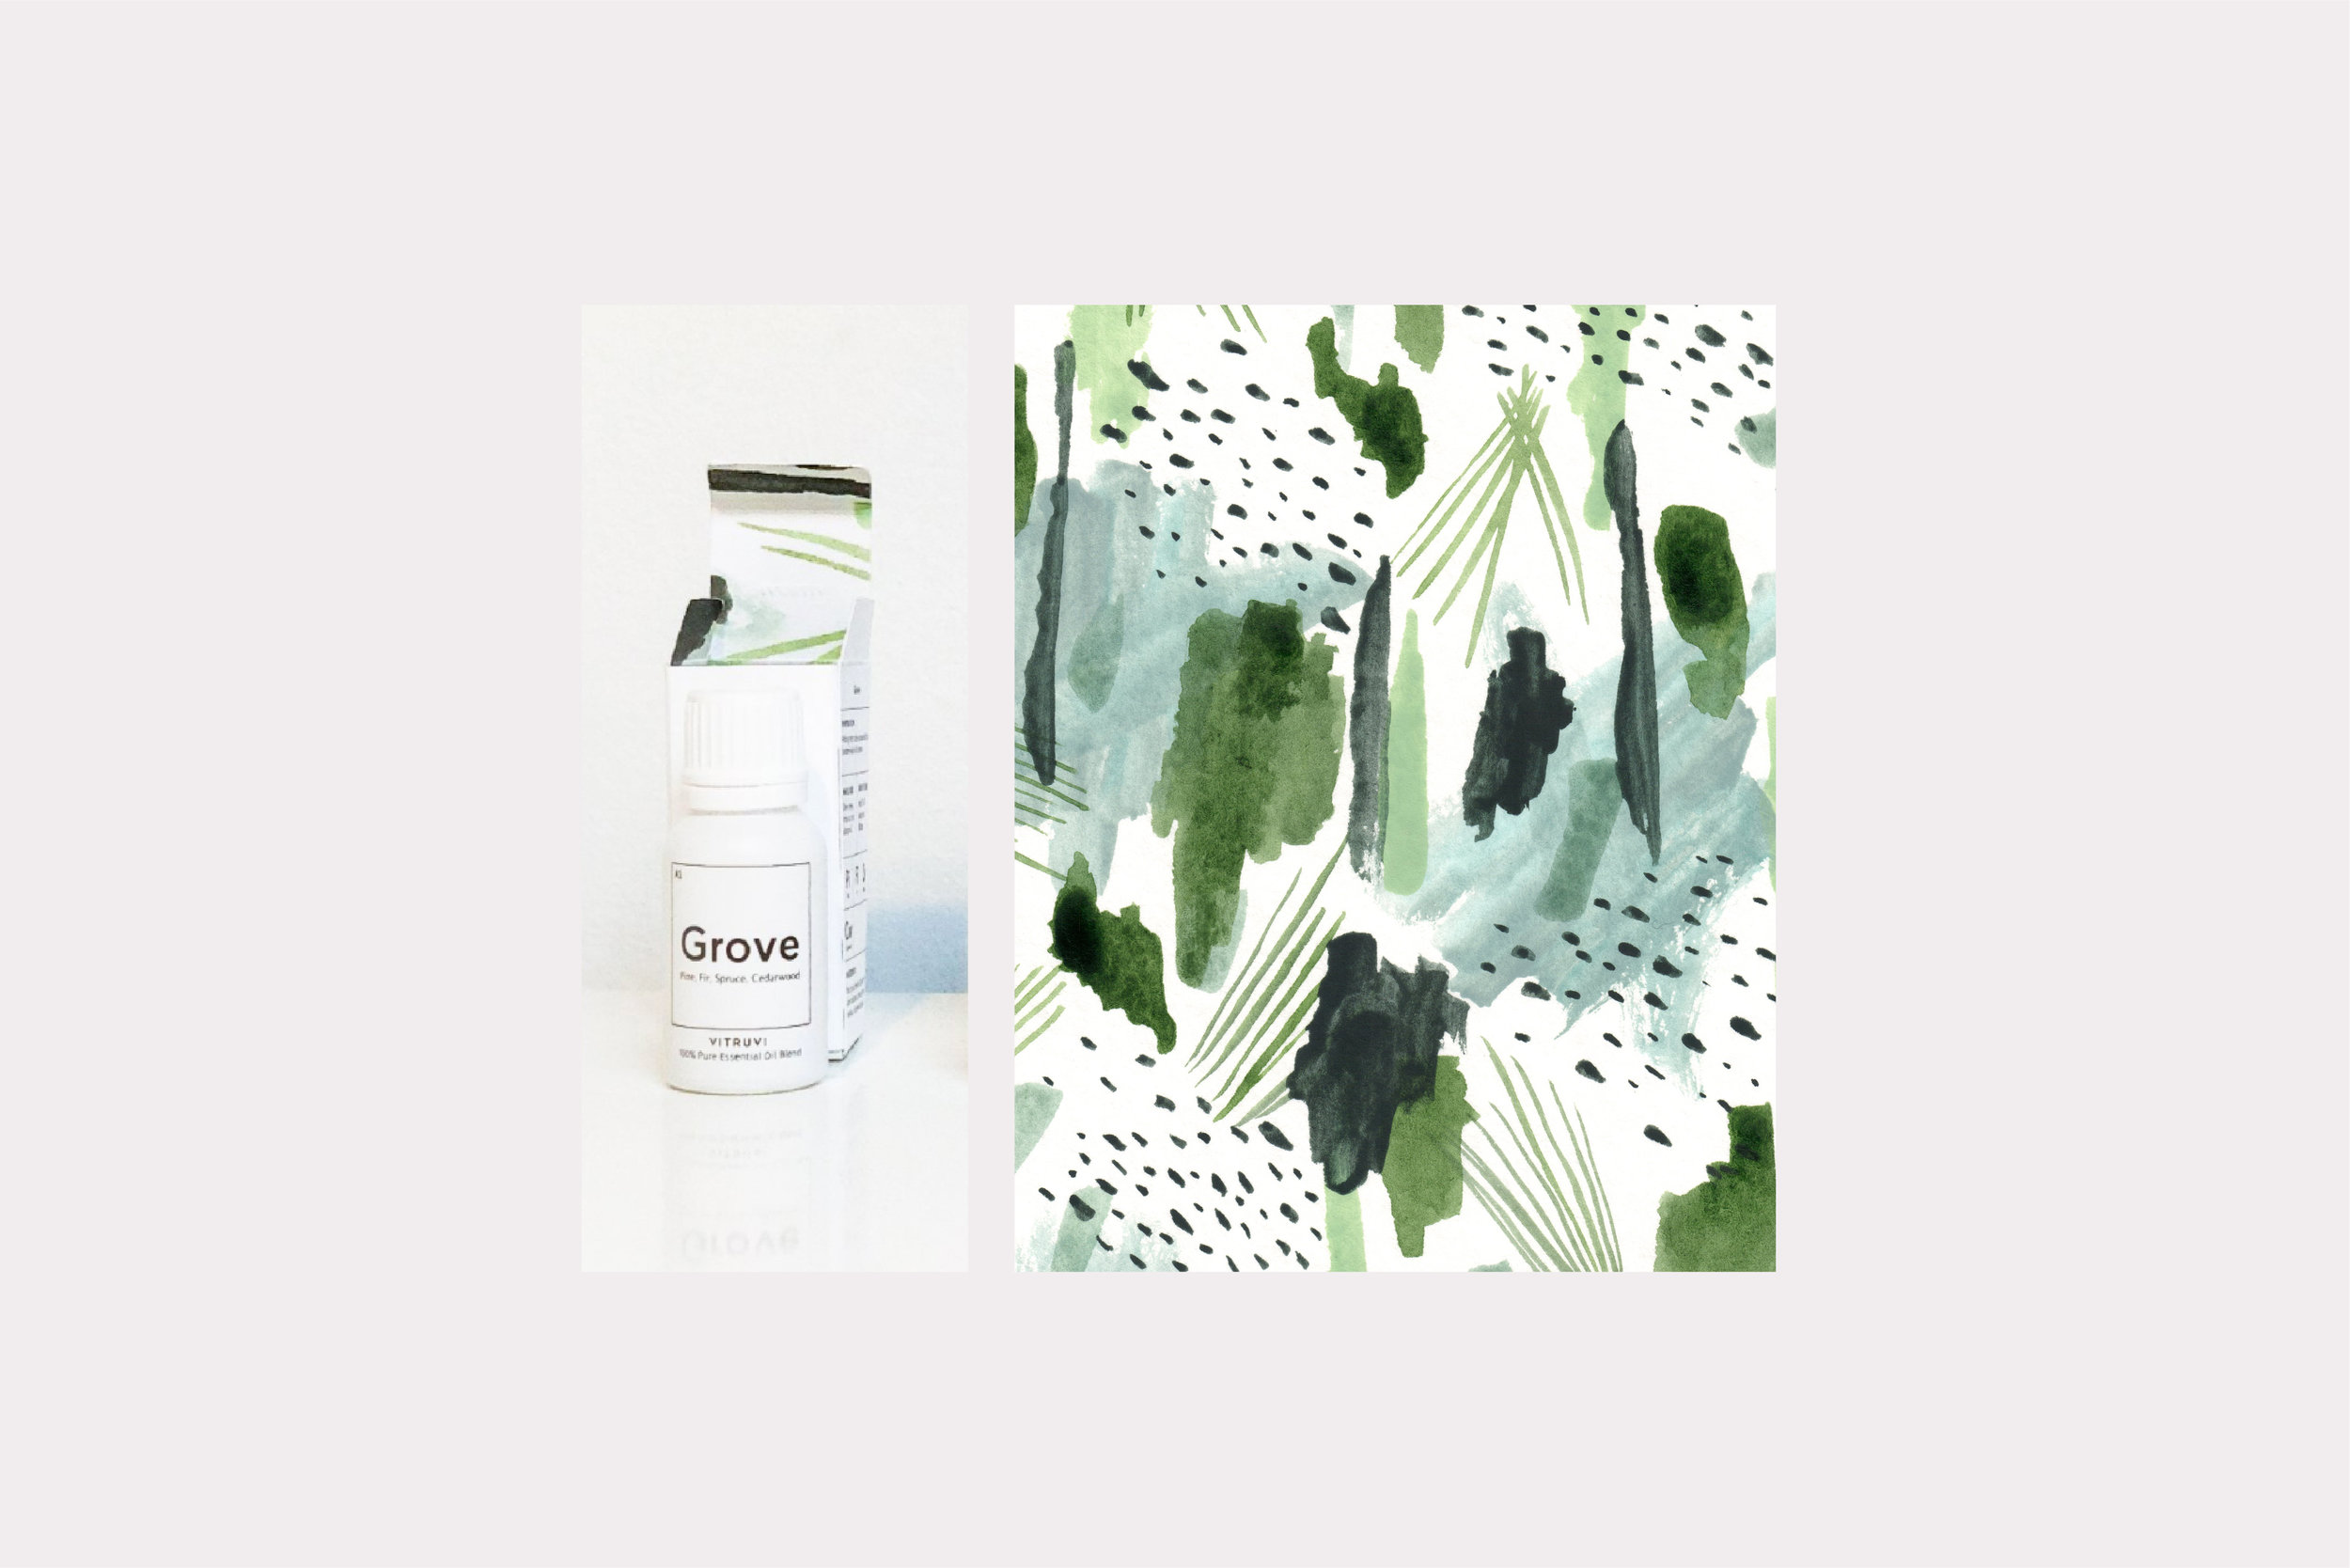 Wilkie_maryclarewilkie-vitruvi-essential oil-boxdesign-03.jpg